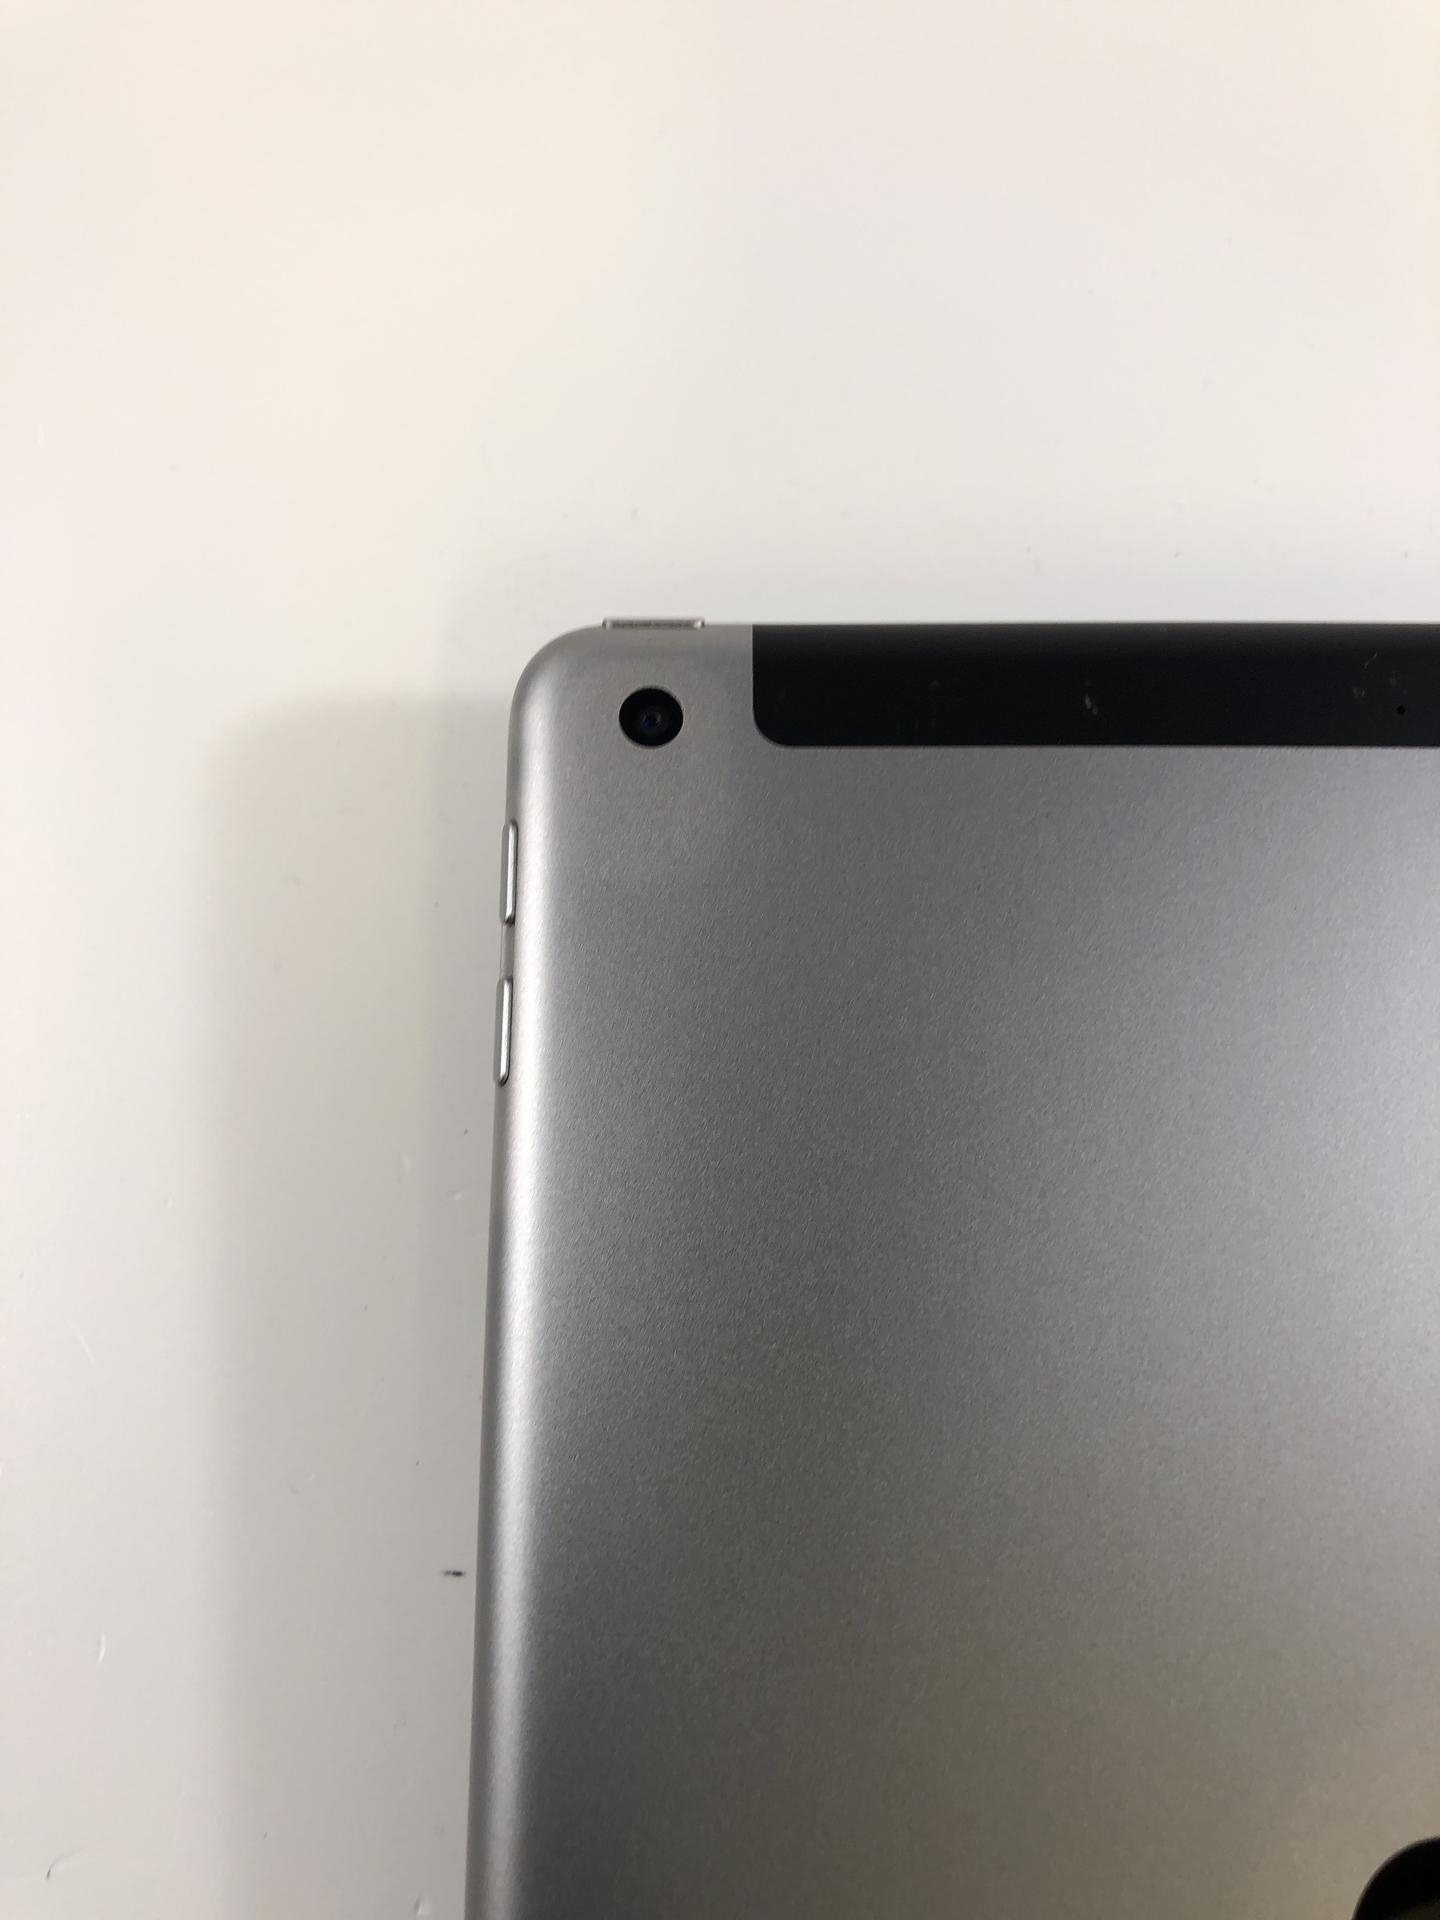 iPad 5 Wi-Fi + Cellular 32GB, 32GB, Space Gray, Kuva 4